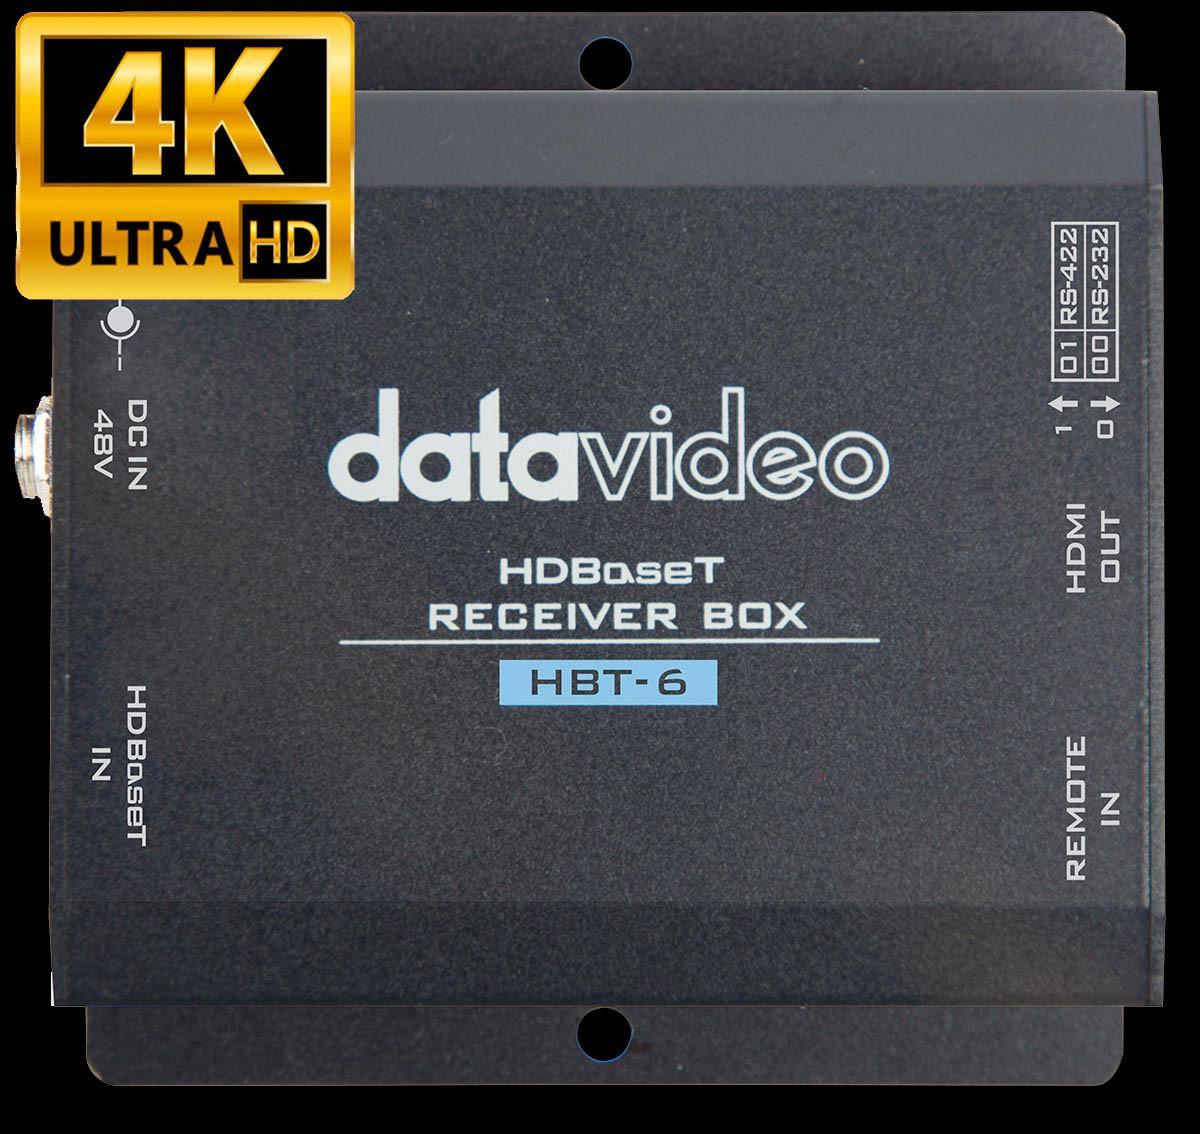 Unterstützt HDMI Deep Color & Full 3D & 4K@30